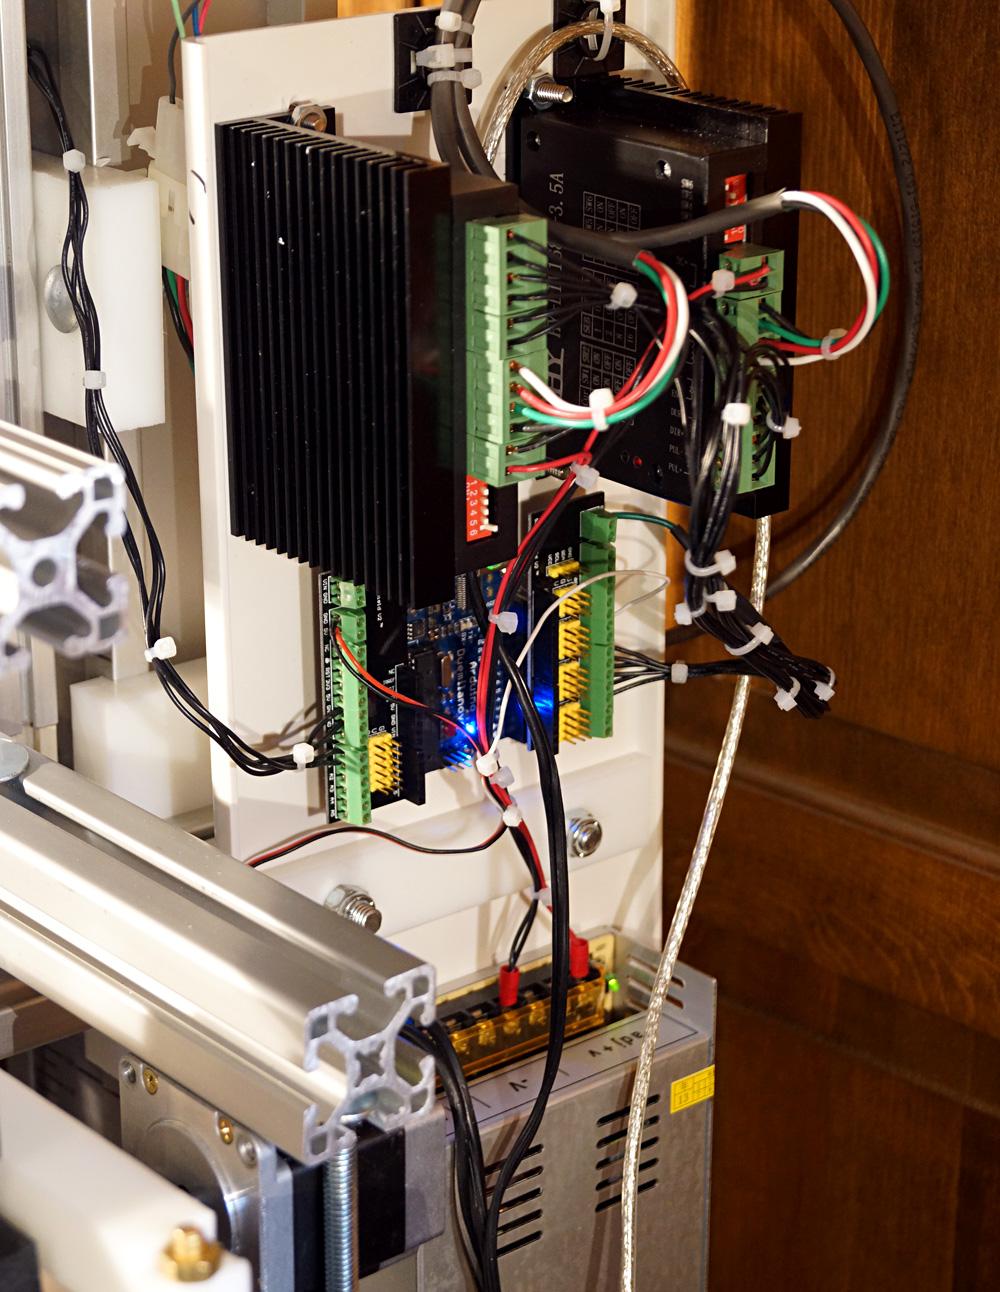 printer electronics 1 3d printer rebuild, software and electronics projects, interests SLA STL at eliteediting.co